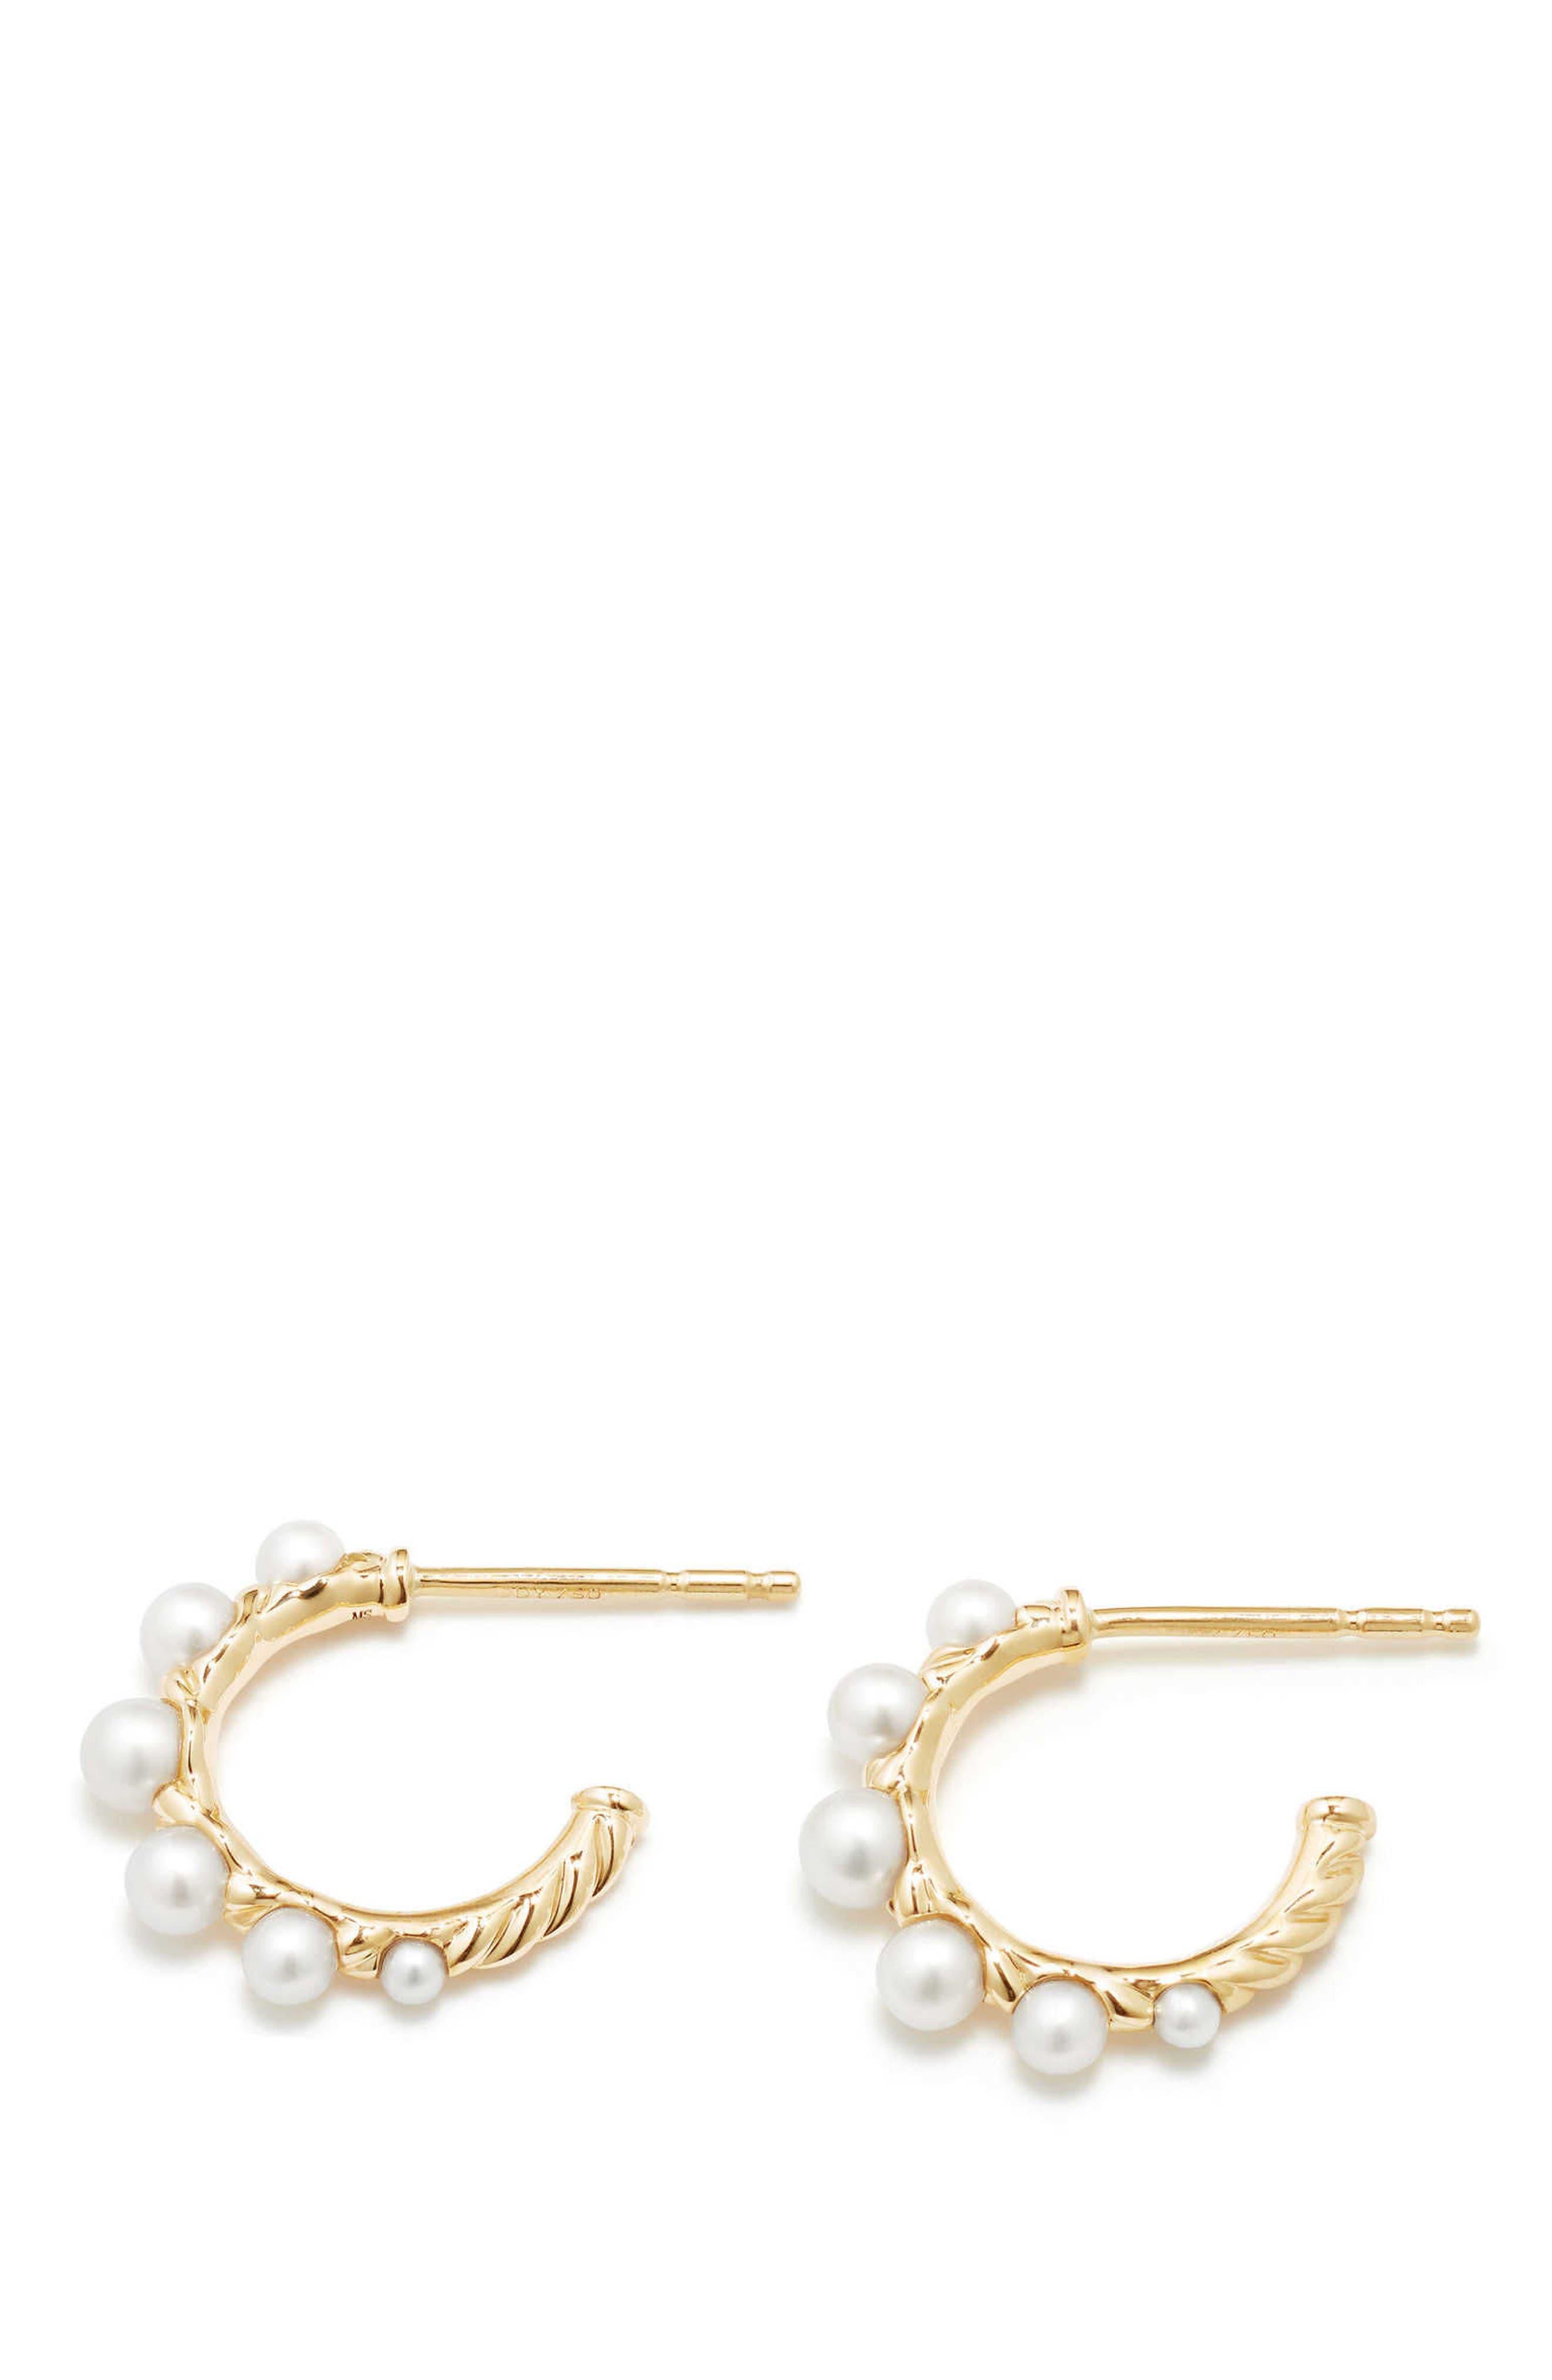 Alternate Image 1 Selected - David Yurman Petite Perle Graduated Pearl Hoop Earrings in 18K Gold